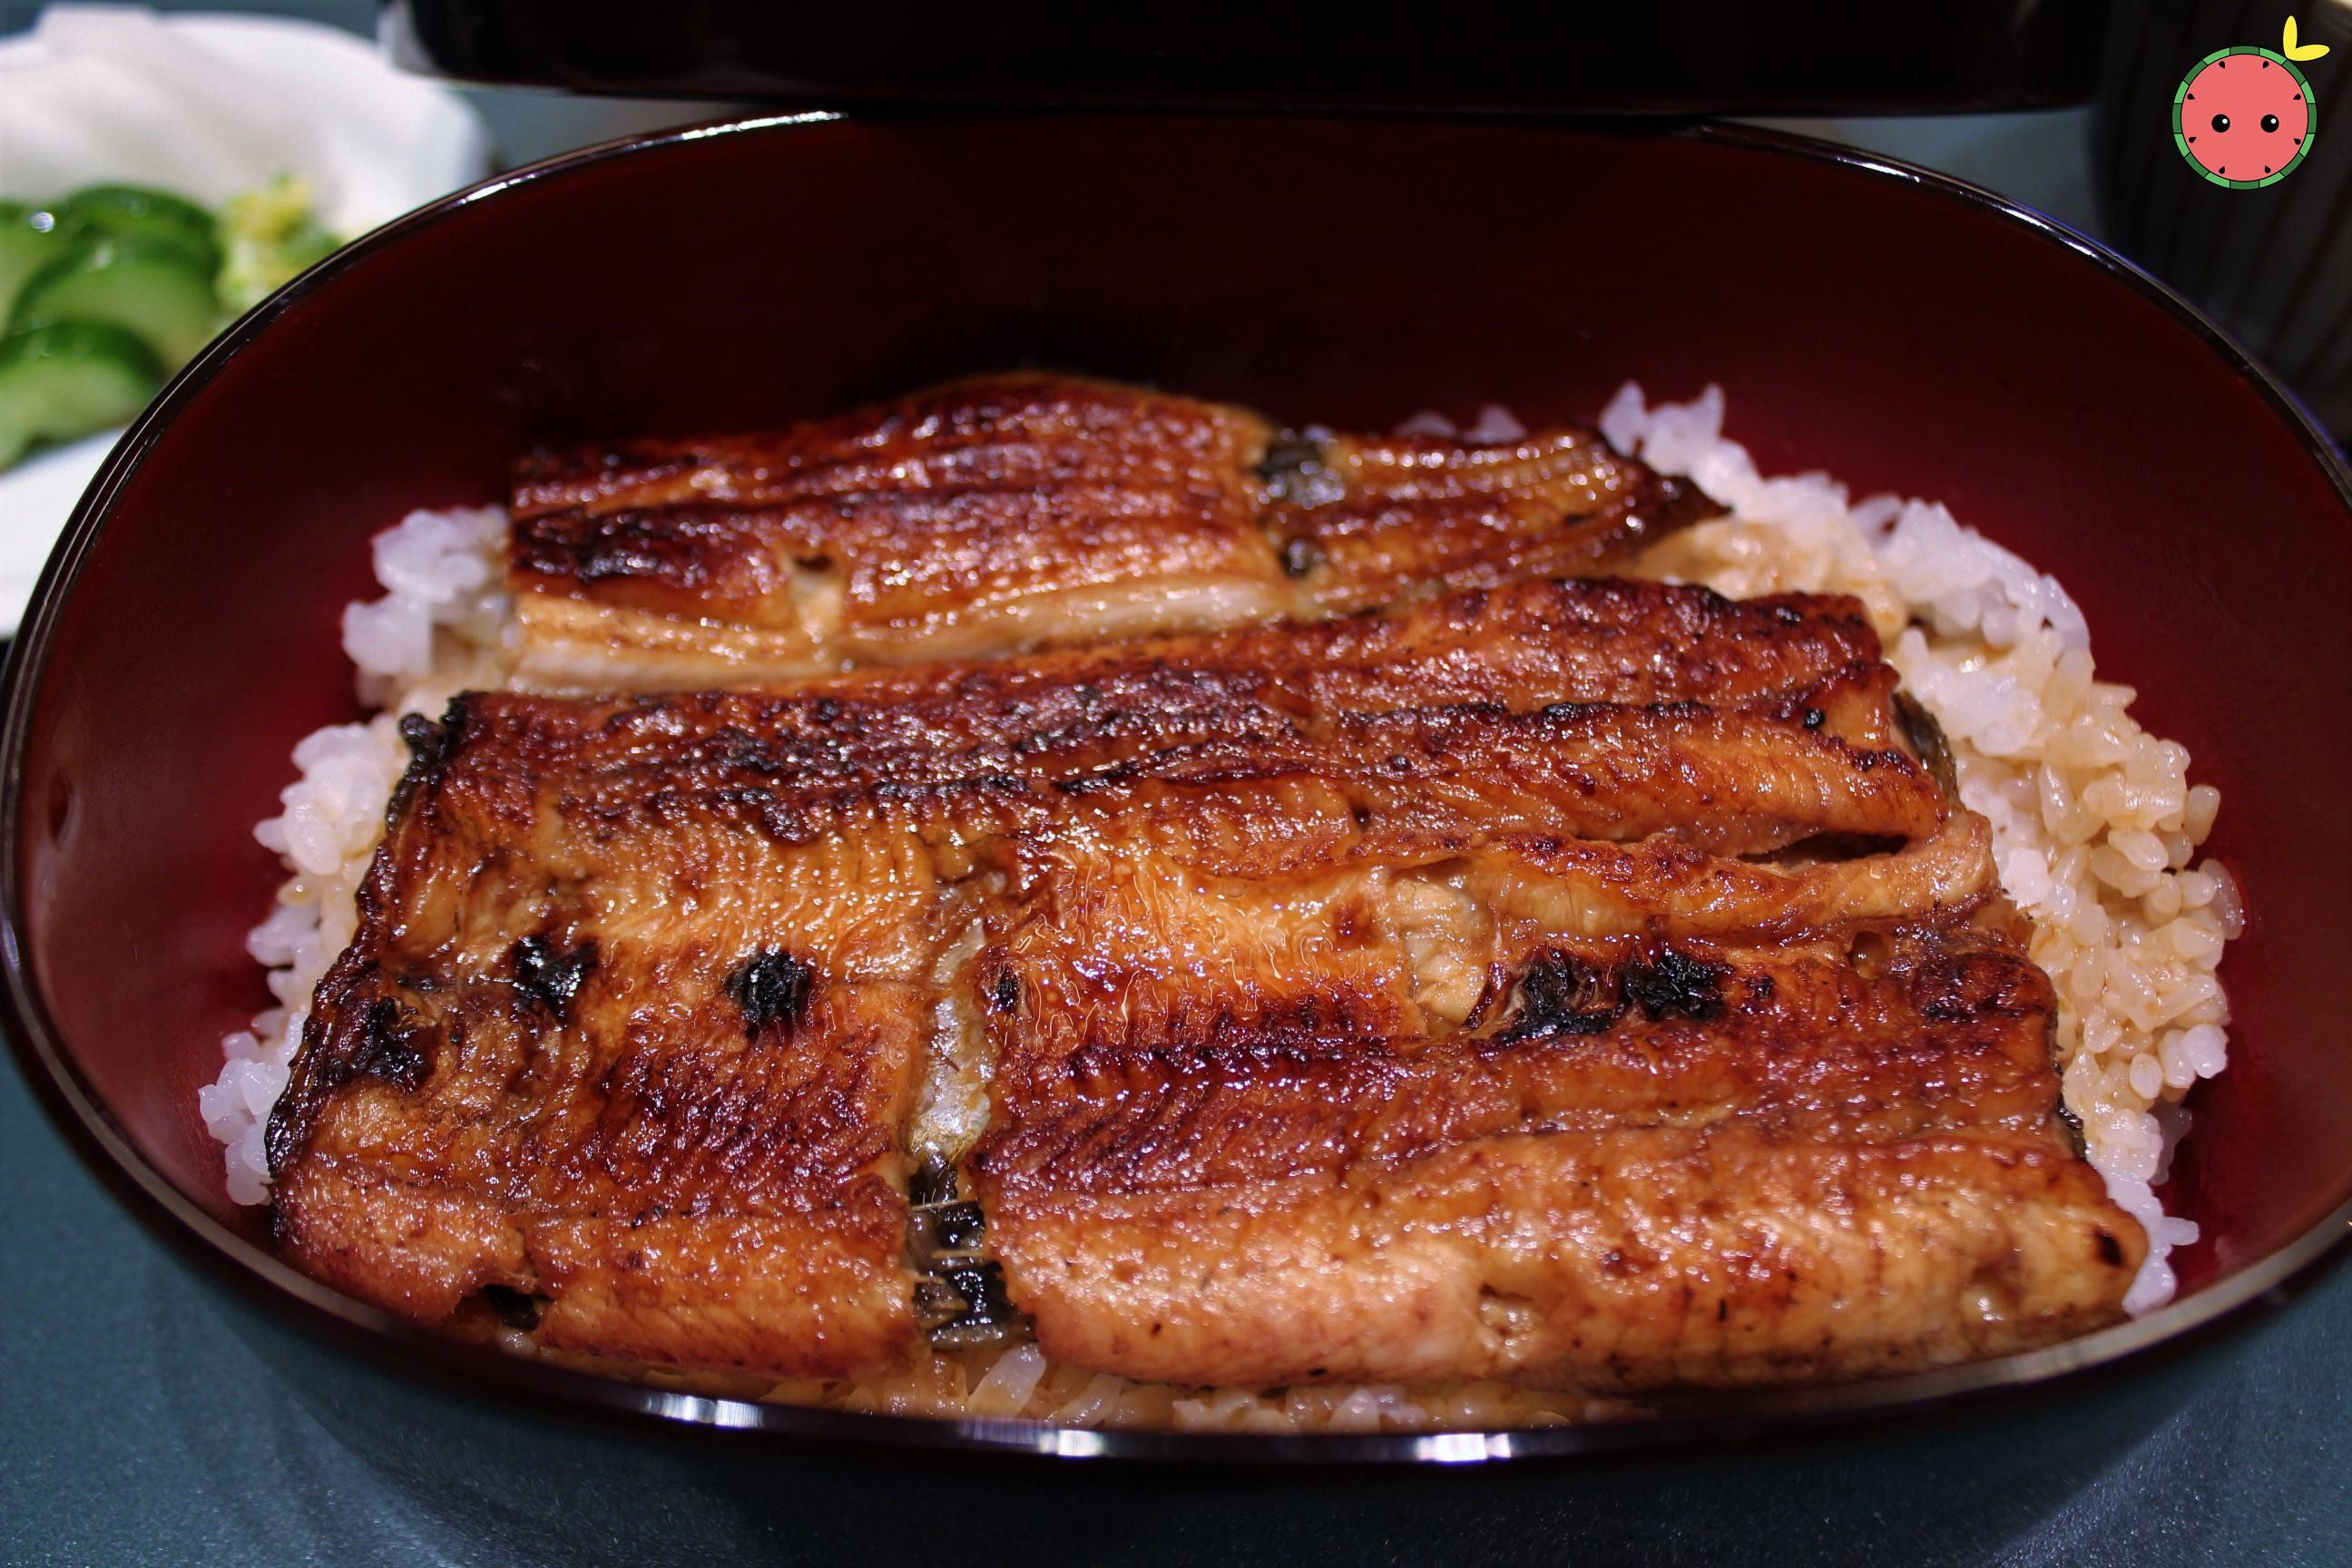 Unagi Don - Grilled Eel Rice Bowl